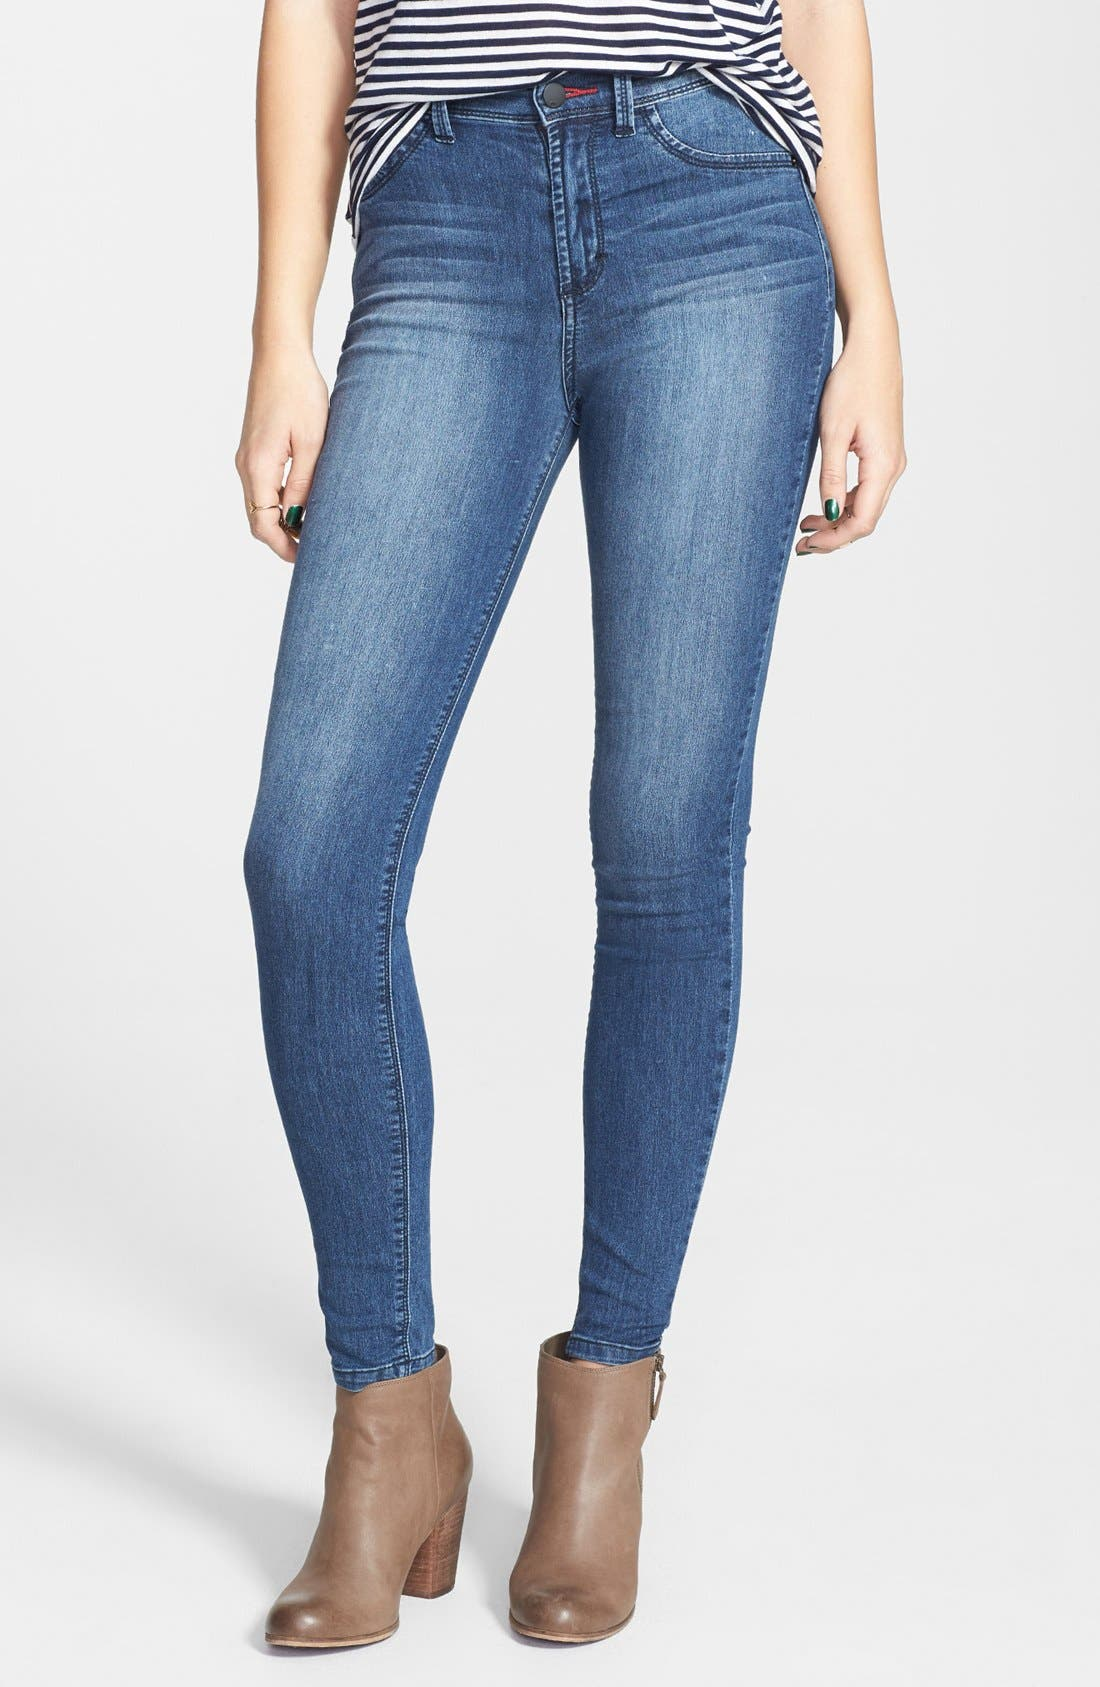 Alternate Image 1 Selected - SP Black High Waist Skinny Jeans (Medium Wash) (Juniors) (Online Only)